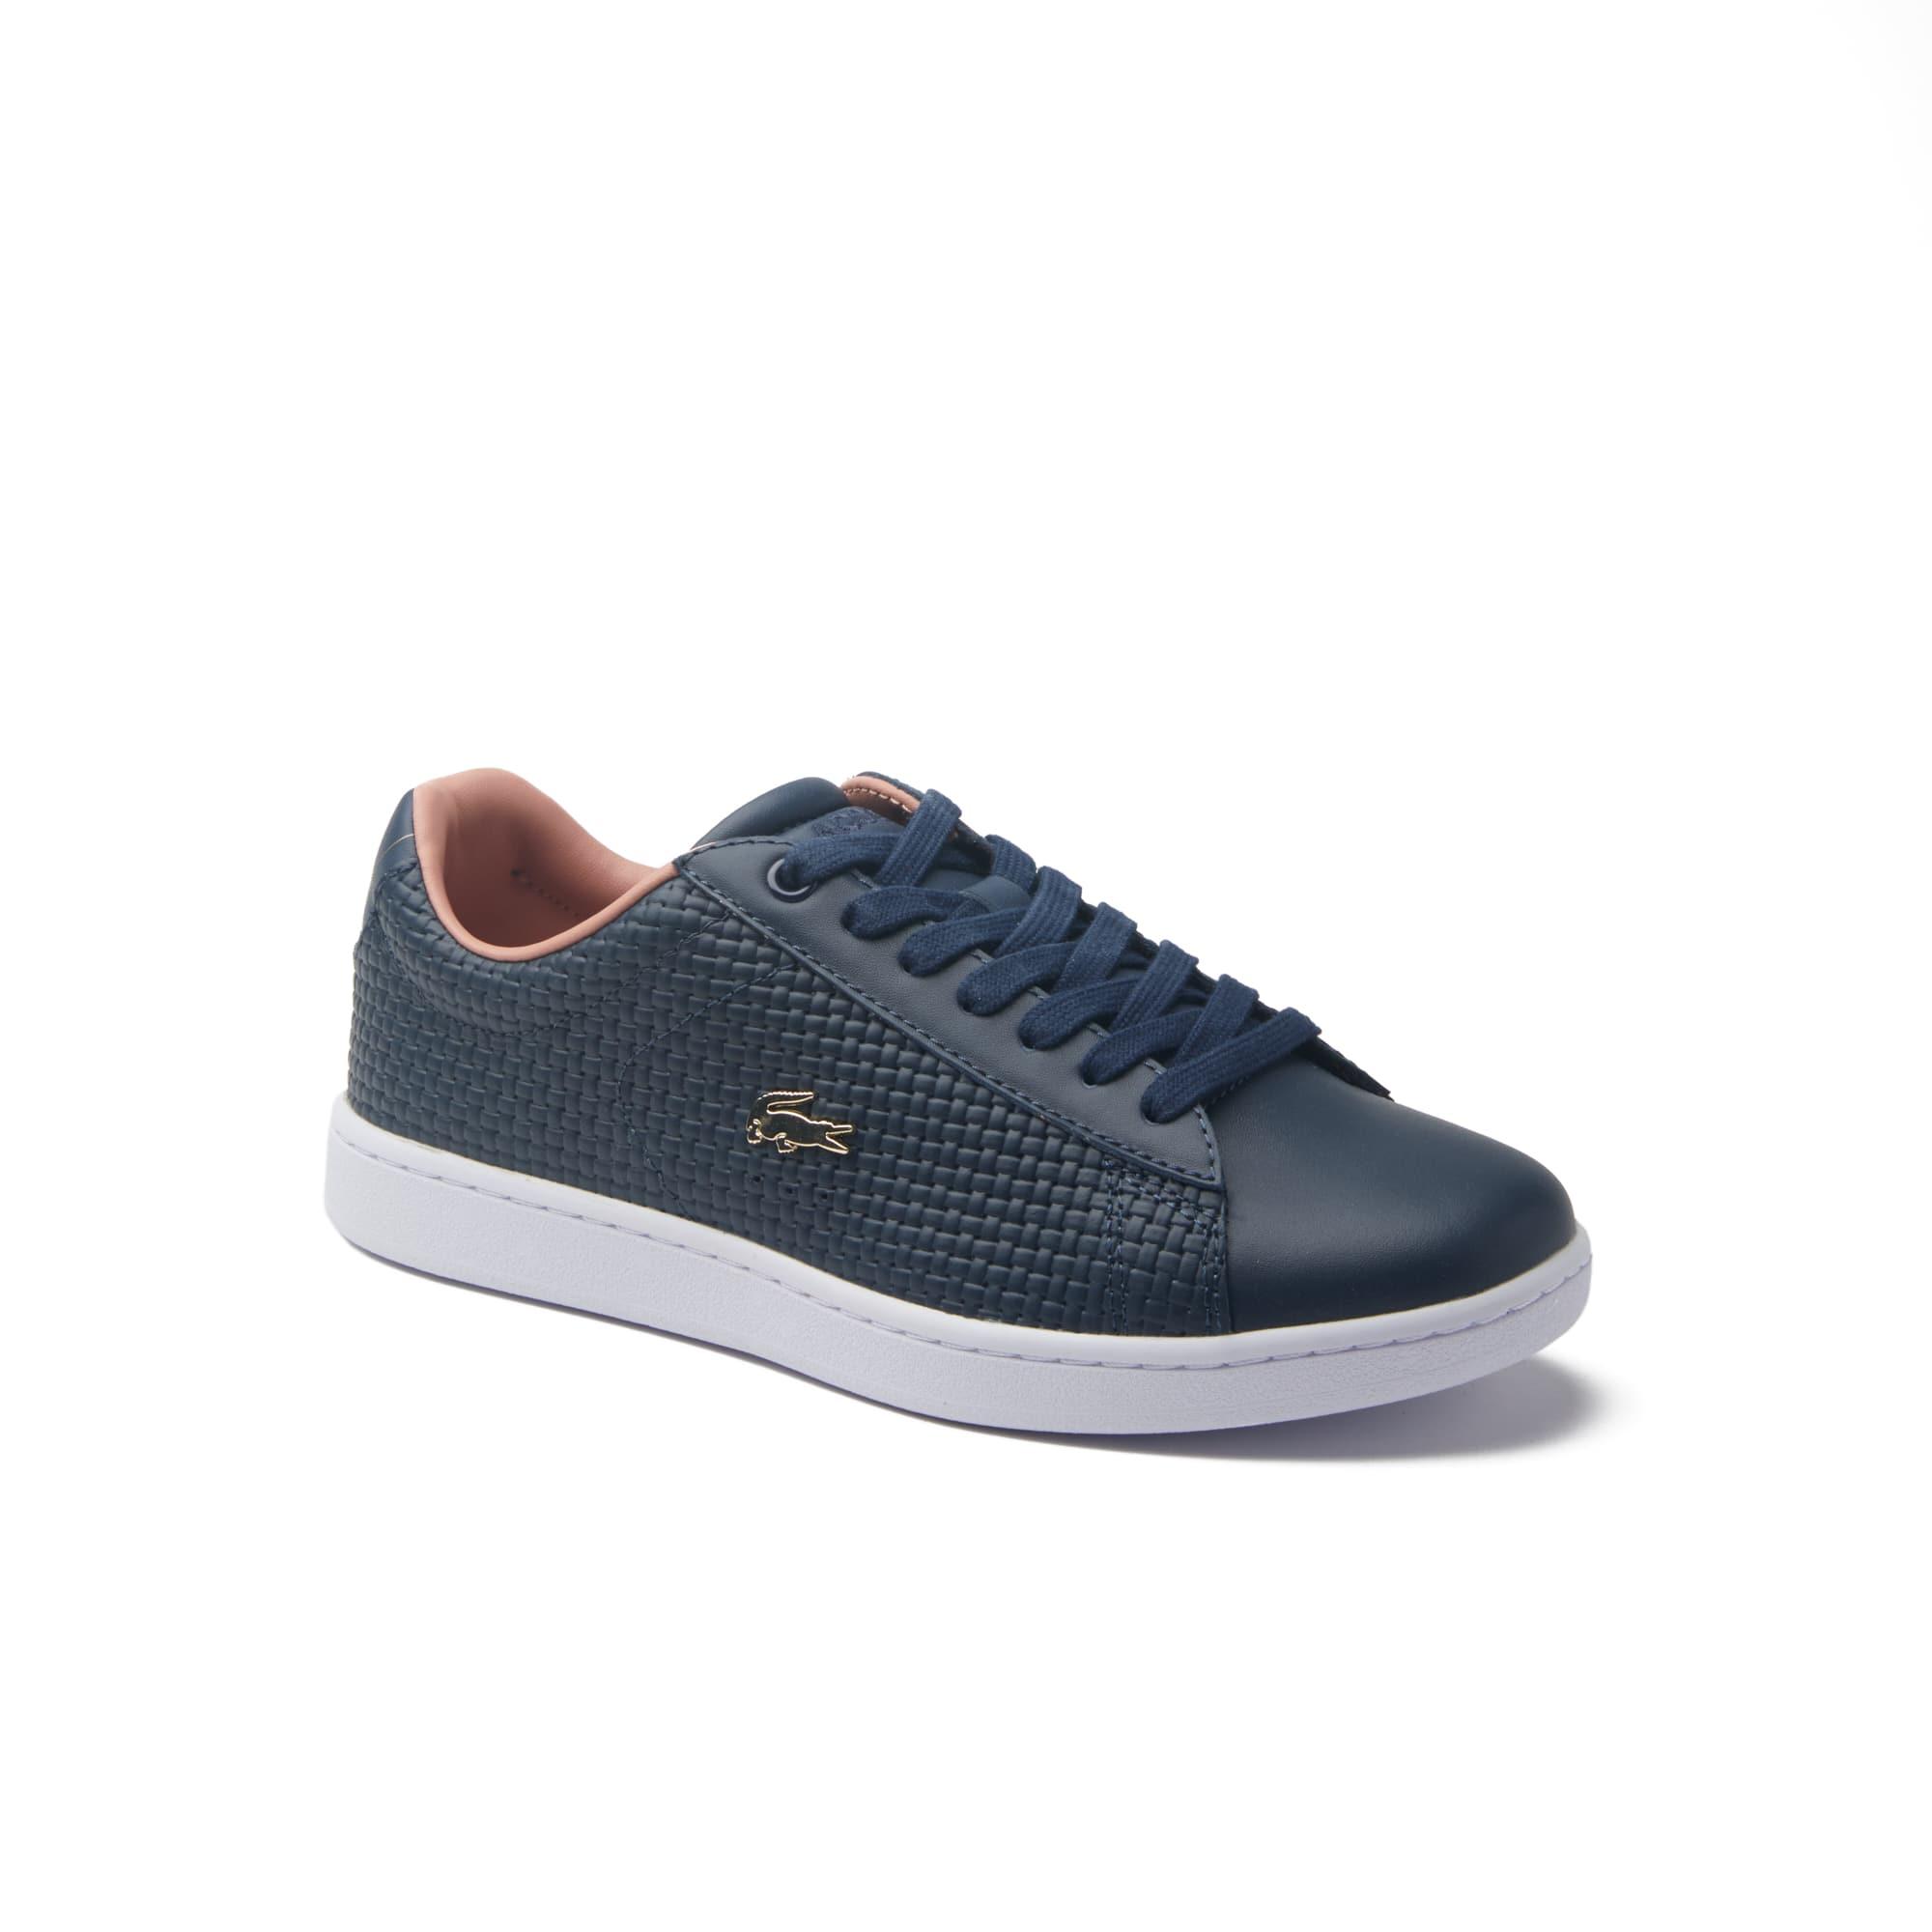 Sneakers Carnaby Evo in pelle intrecciata